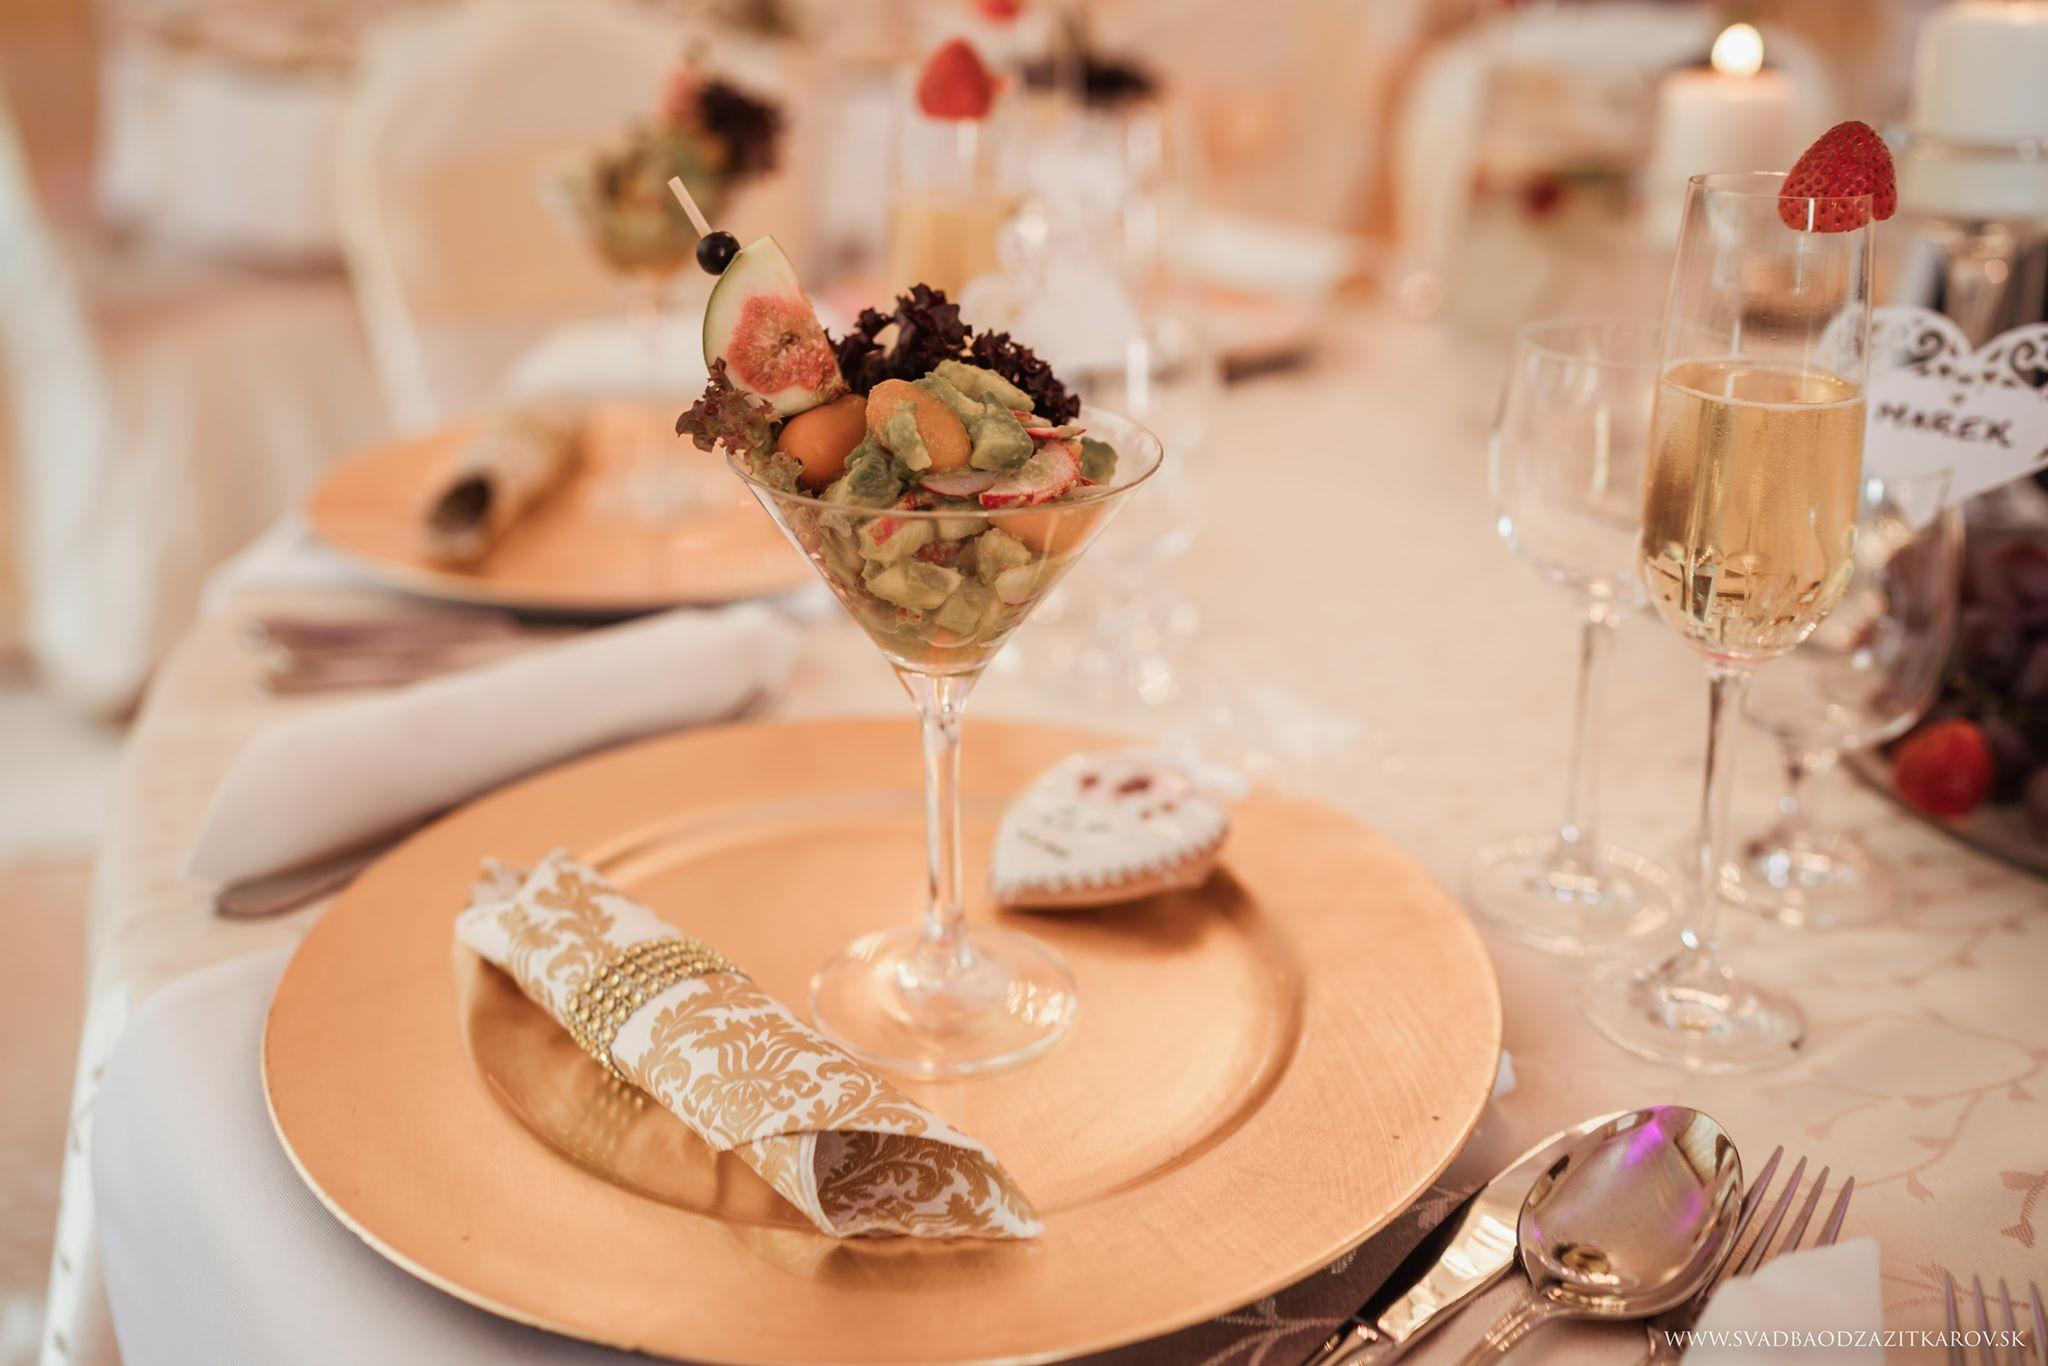 wedding-slovakia-kastiel-hotel-svadbajpg